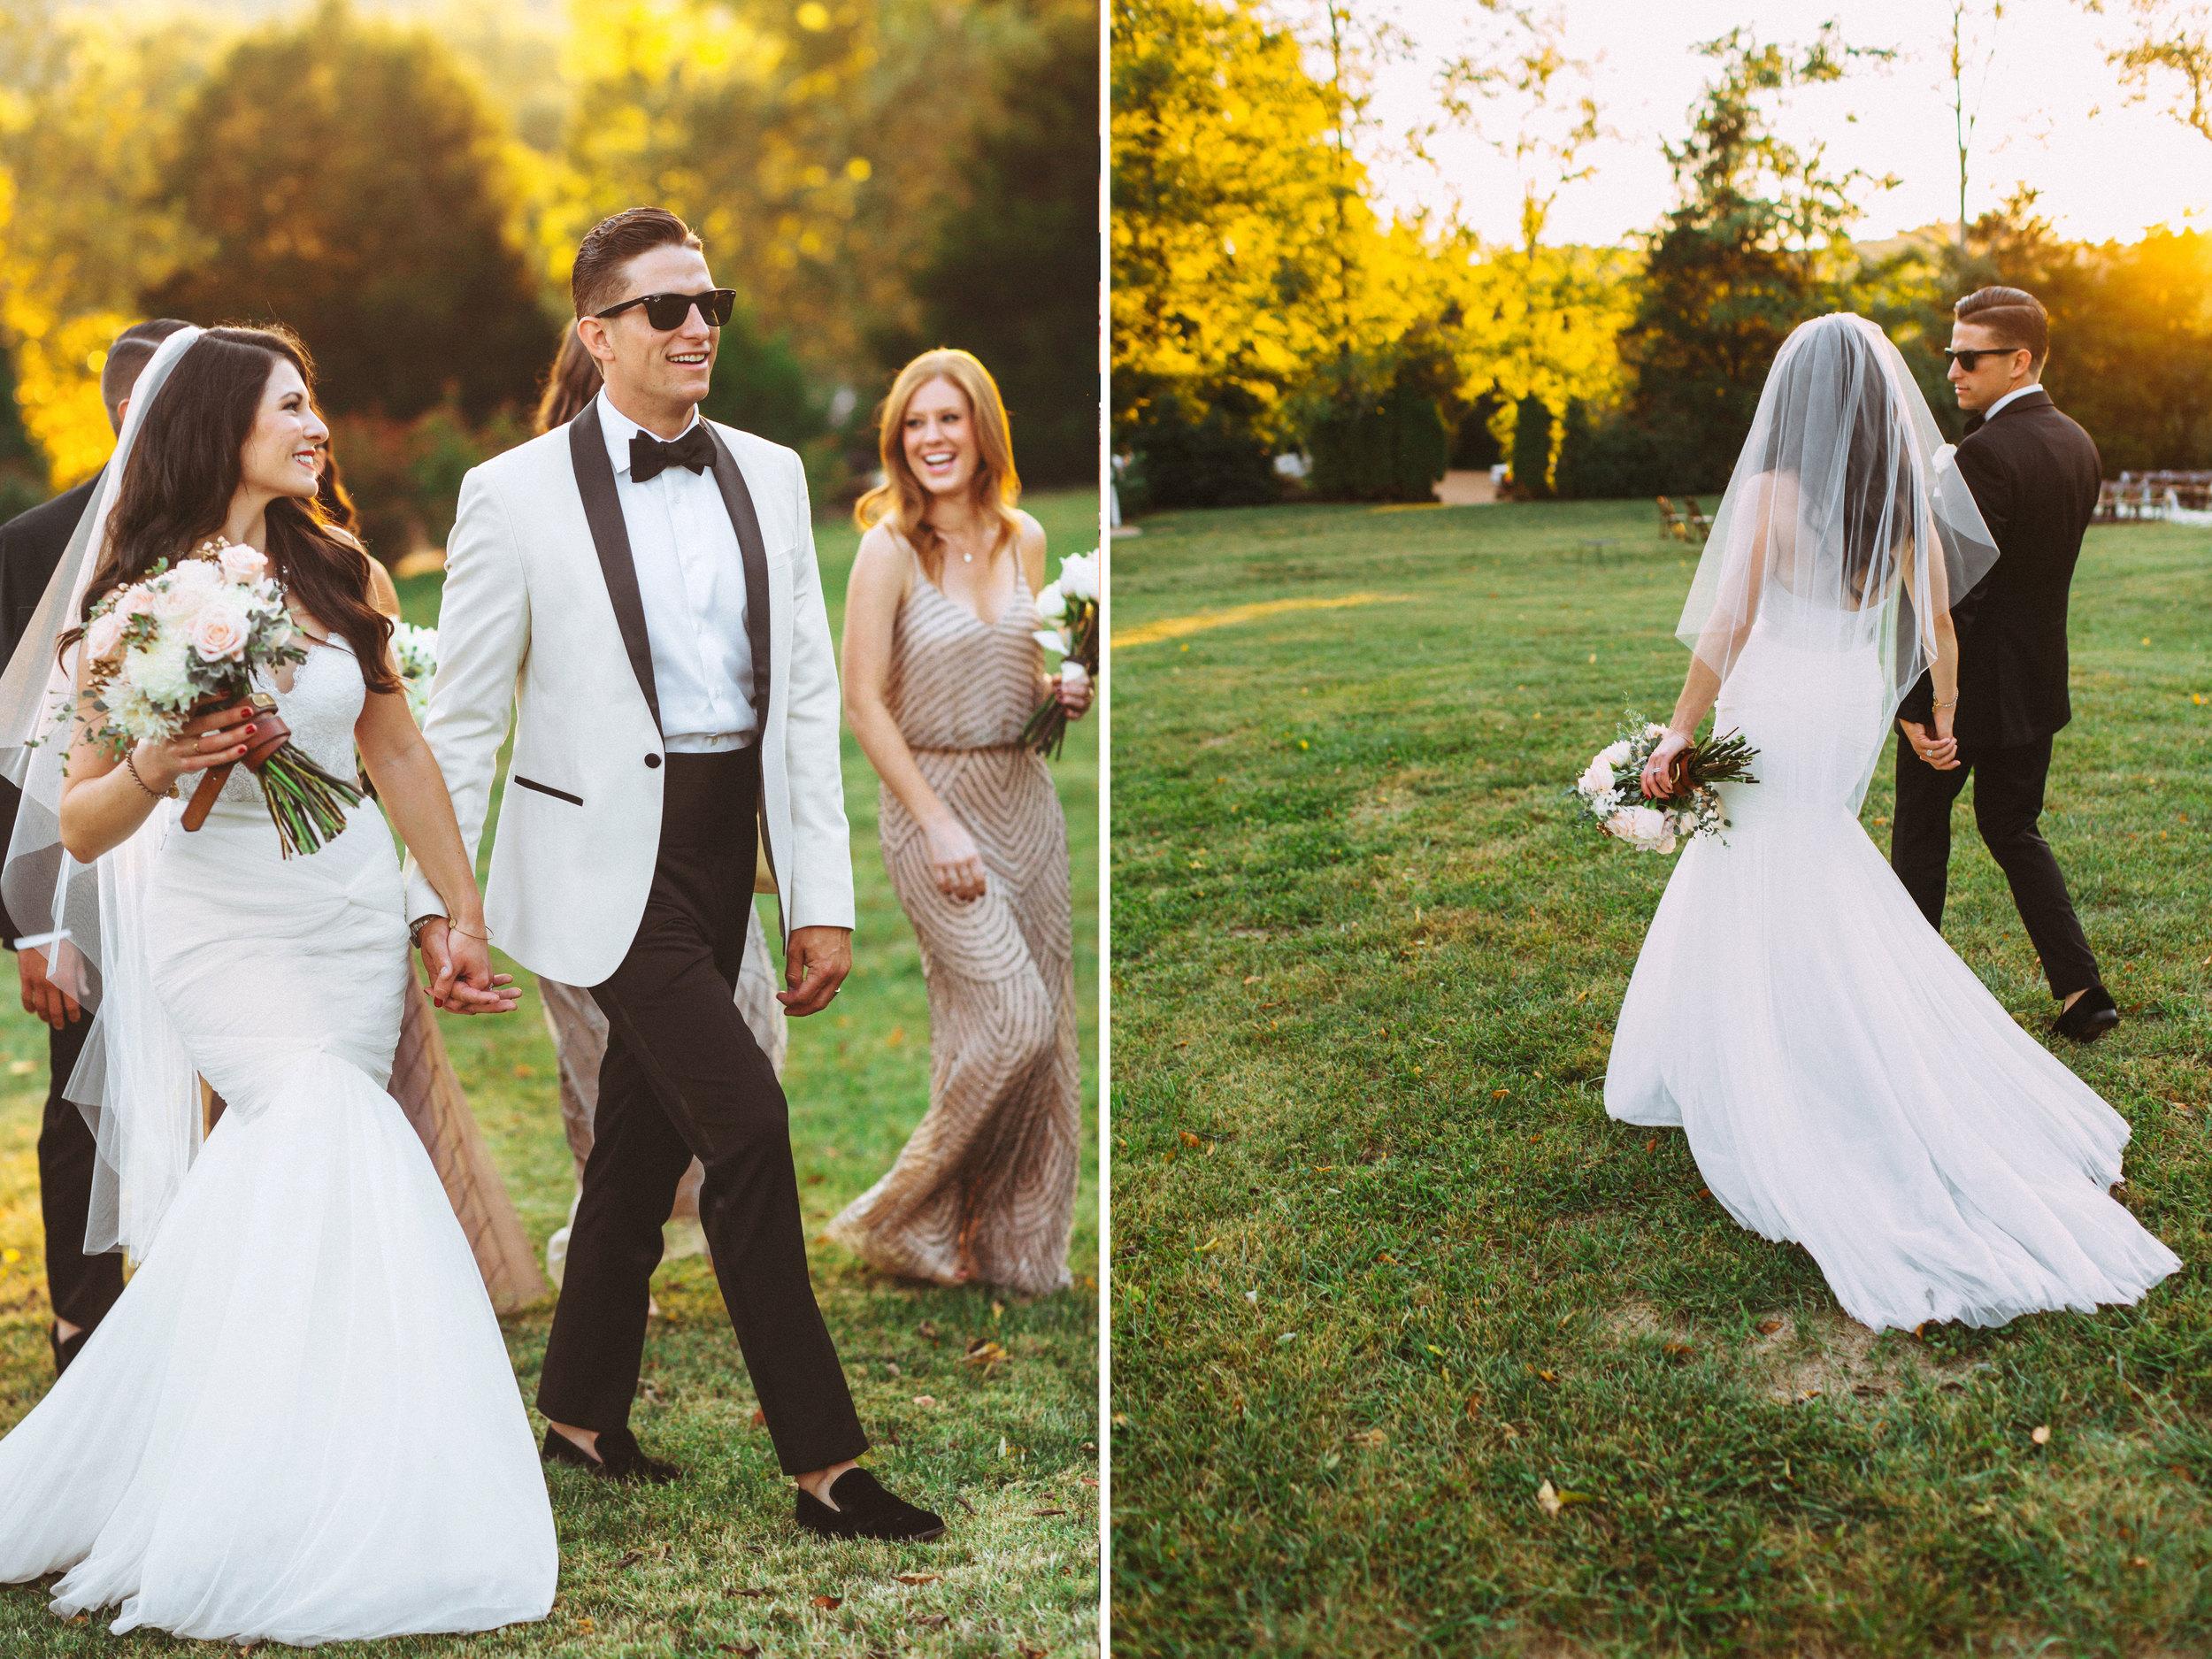 Me & Mr. Jones Wedding, Black Tie Wedding, Groom Wearing White ASOS Tuxedo, Watters Carina Corset, Watters Amina Skirt, Nashville Wedding